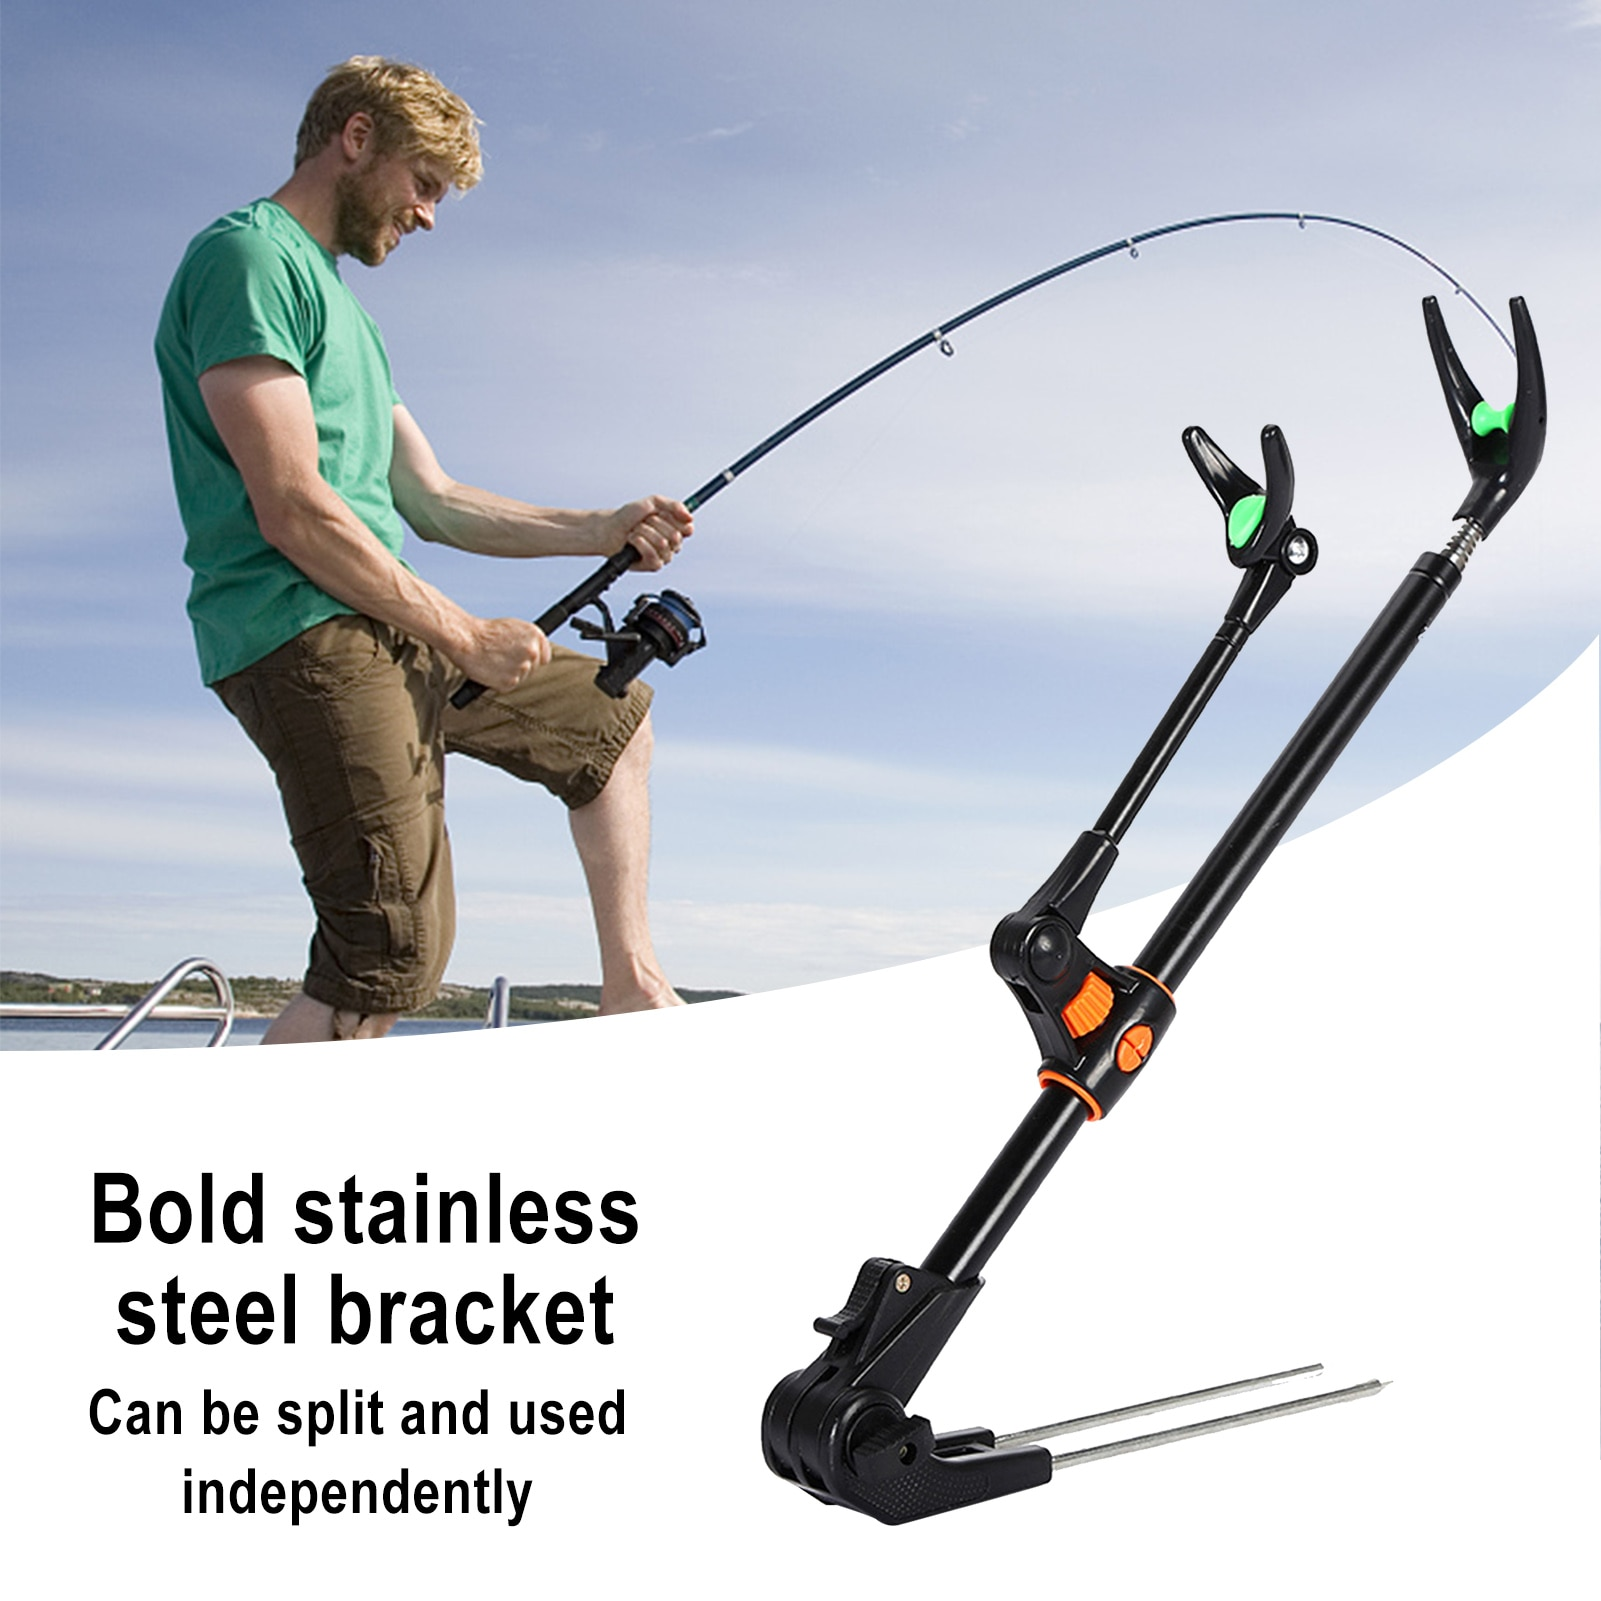 Stainless steel rubber bracket head dual purpose fishing rod bracket 1.7m/ 2.1m/ 2.4m telescopic fishing rod bracket NEW #